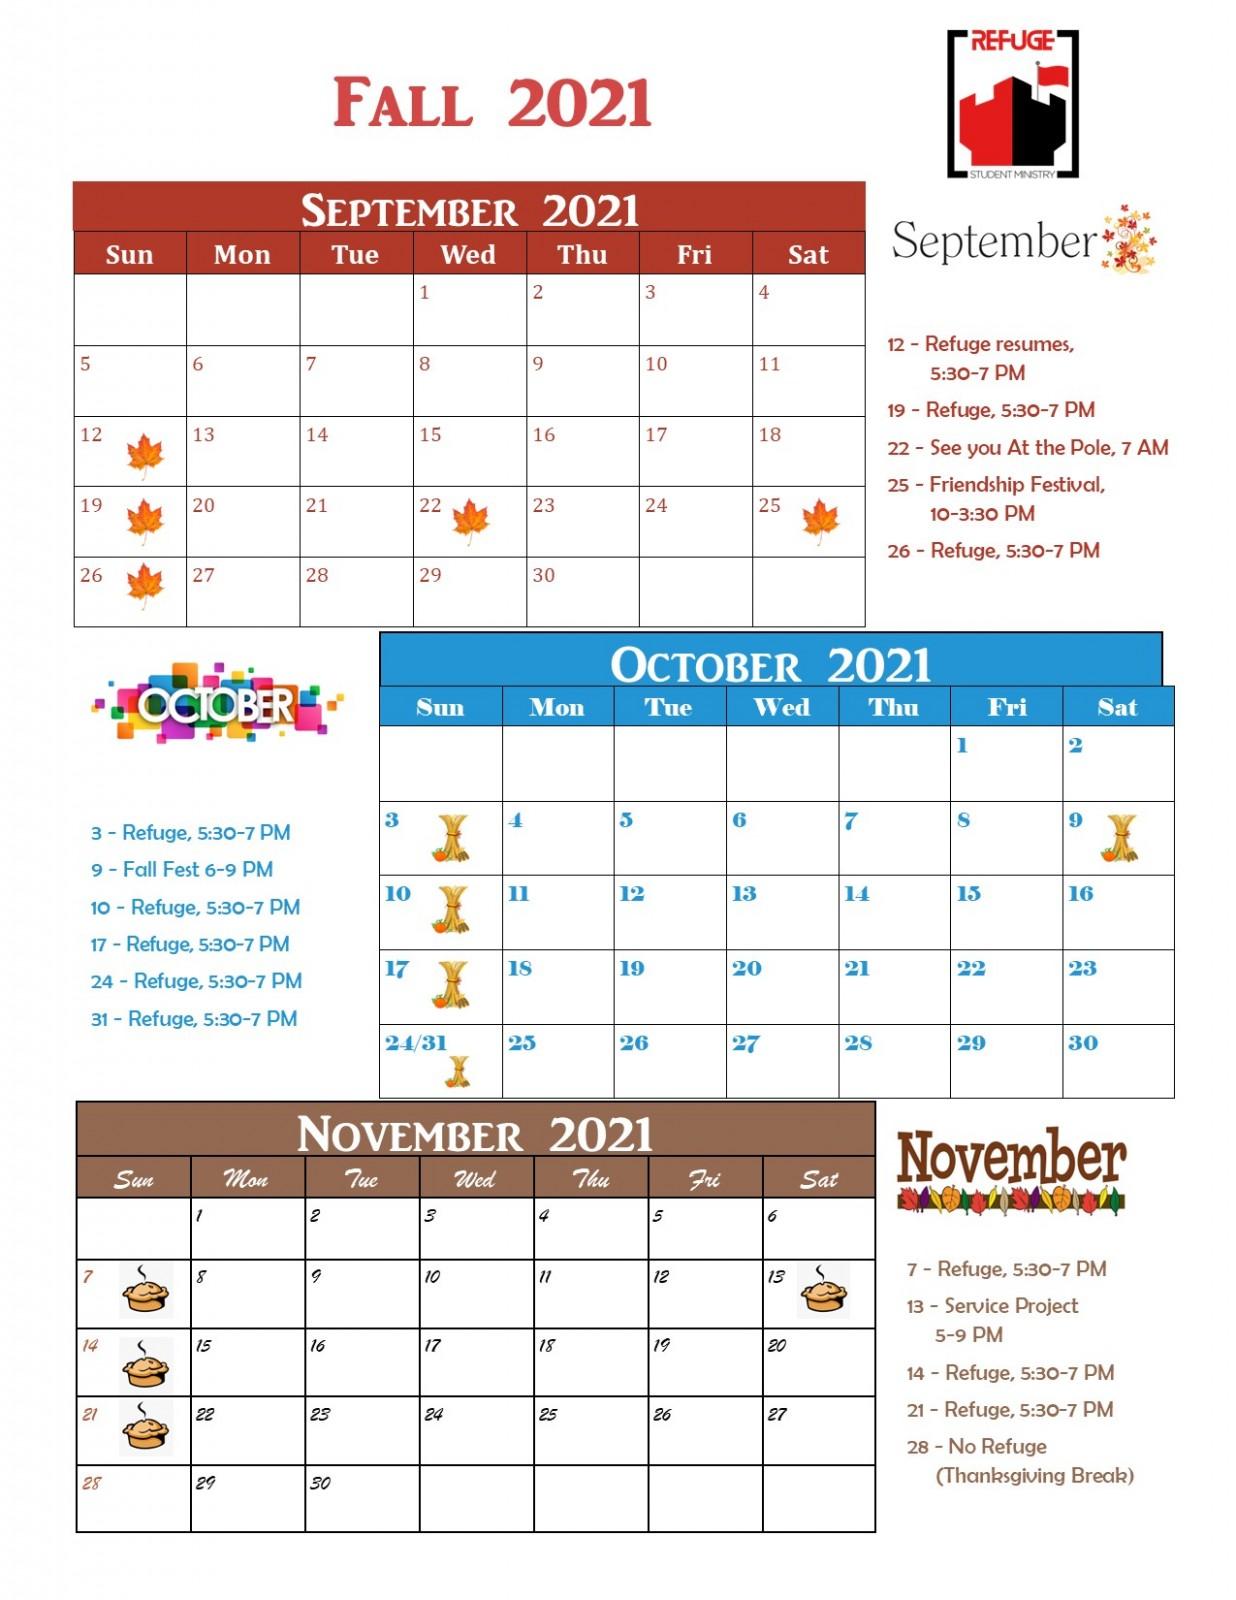 Refuge Fall 2021 calendar